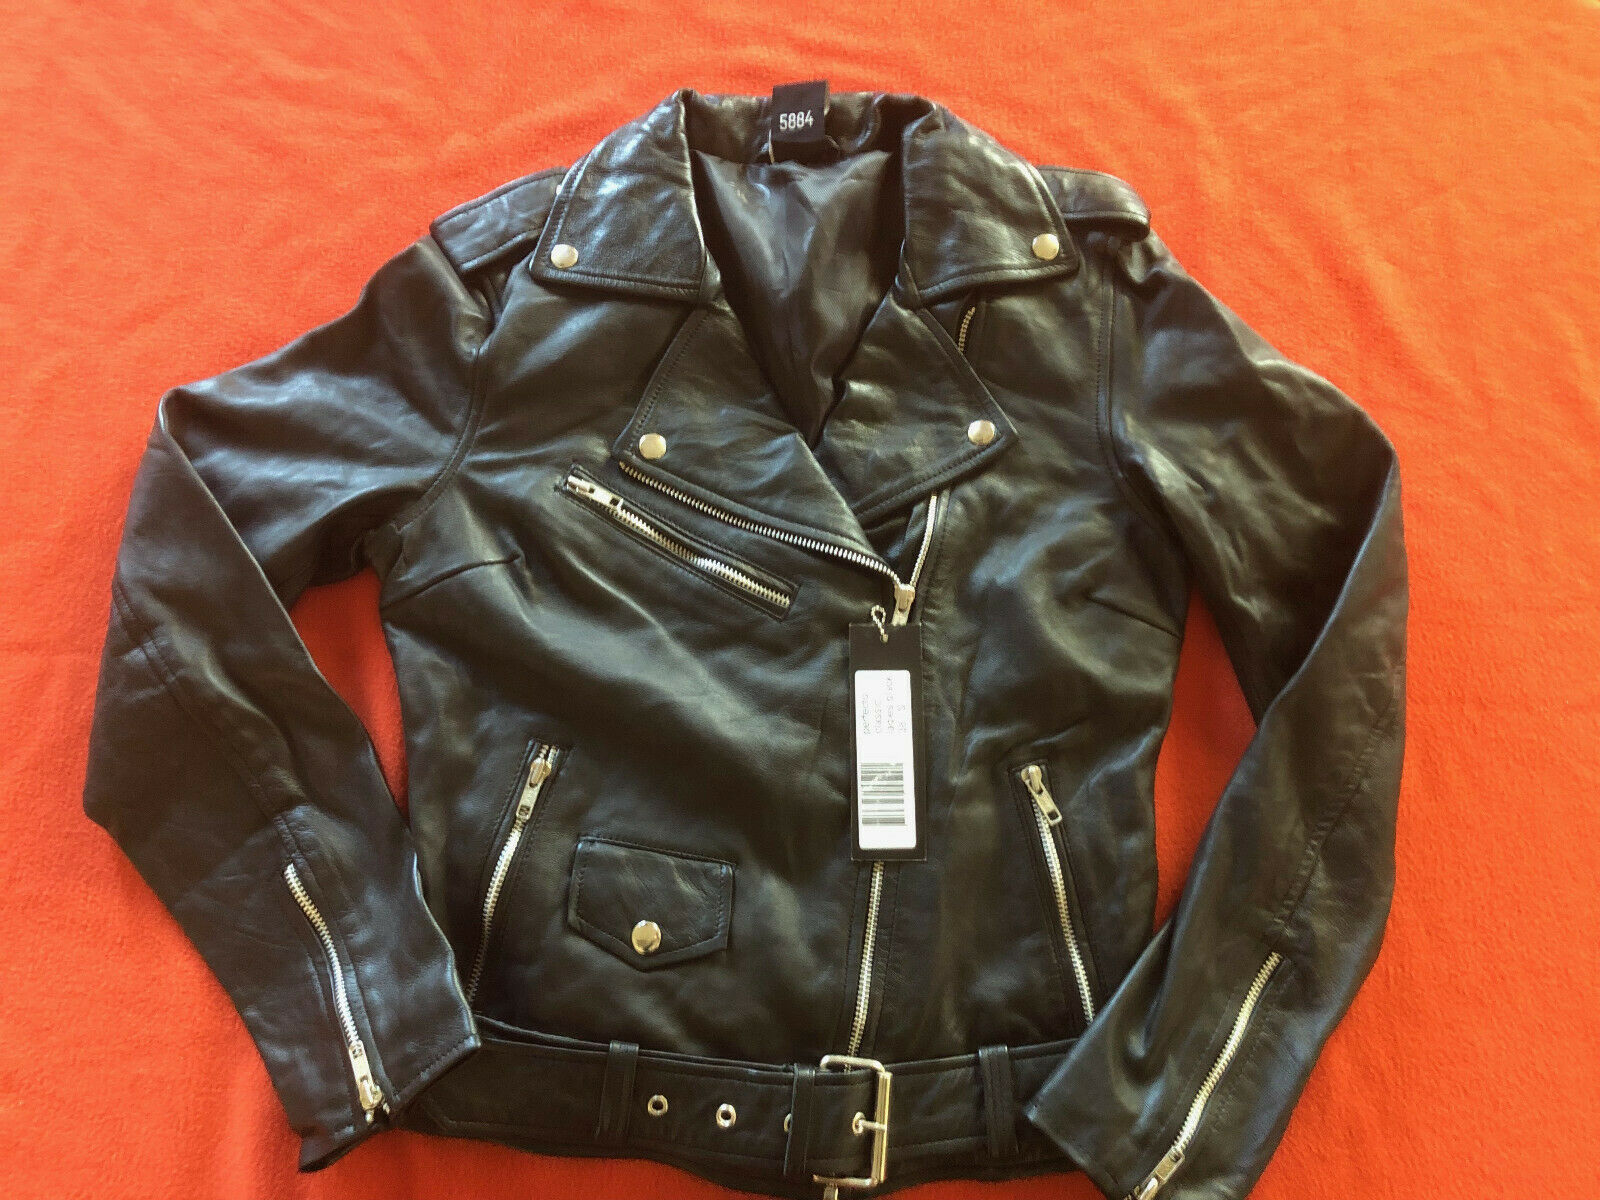 Urban Damen Bikerjacke Lederjacke echt Leder Perfecto Schwarz Größe S 36-38